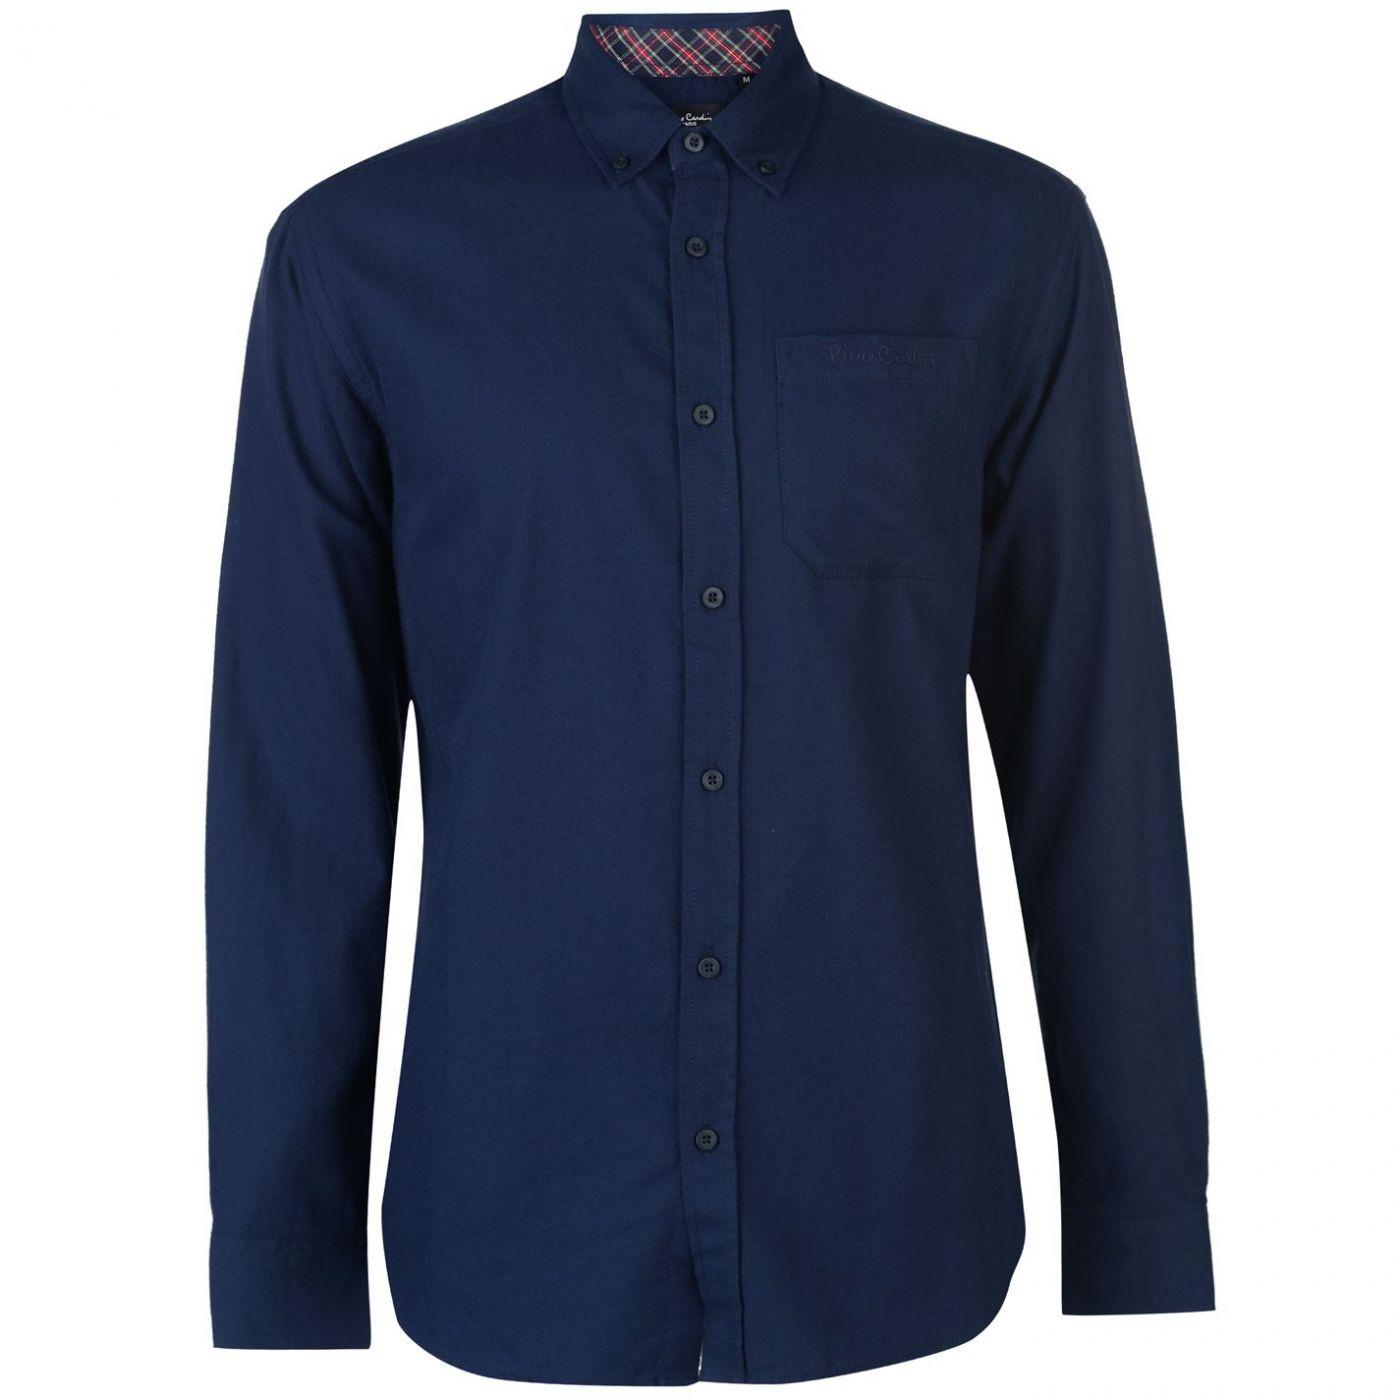 Pierre Cardin C Plain Twill Long Sleeve Shirt Mens